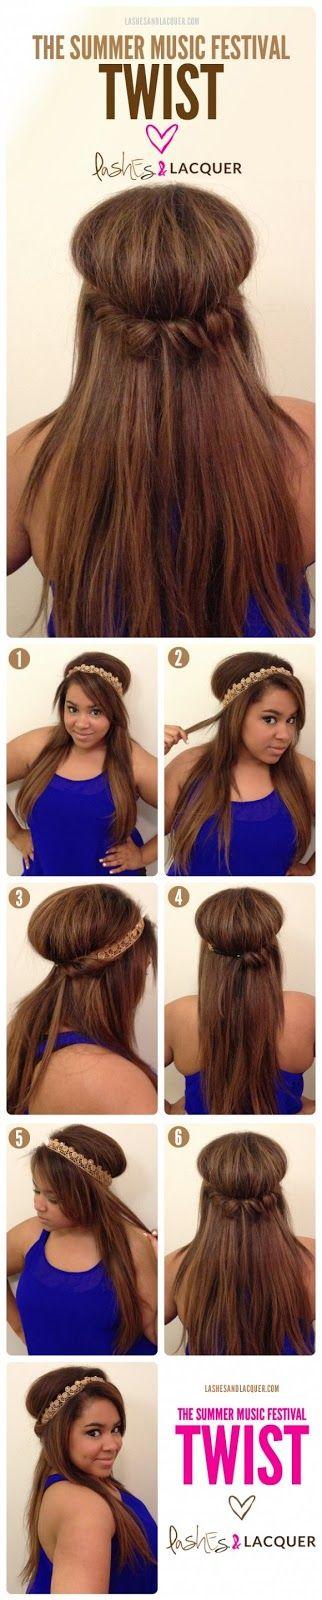 6 easy hair tutorial steps ever | Fashion World